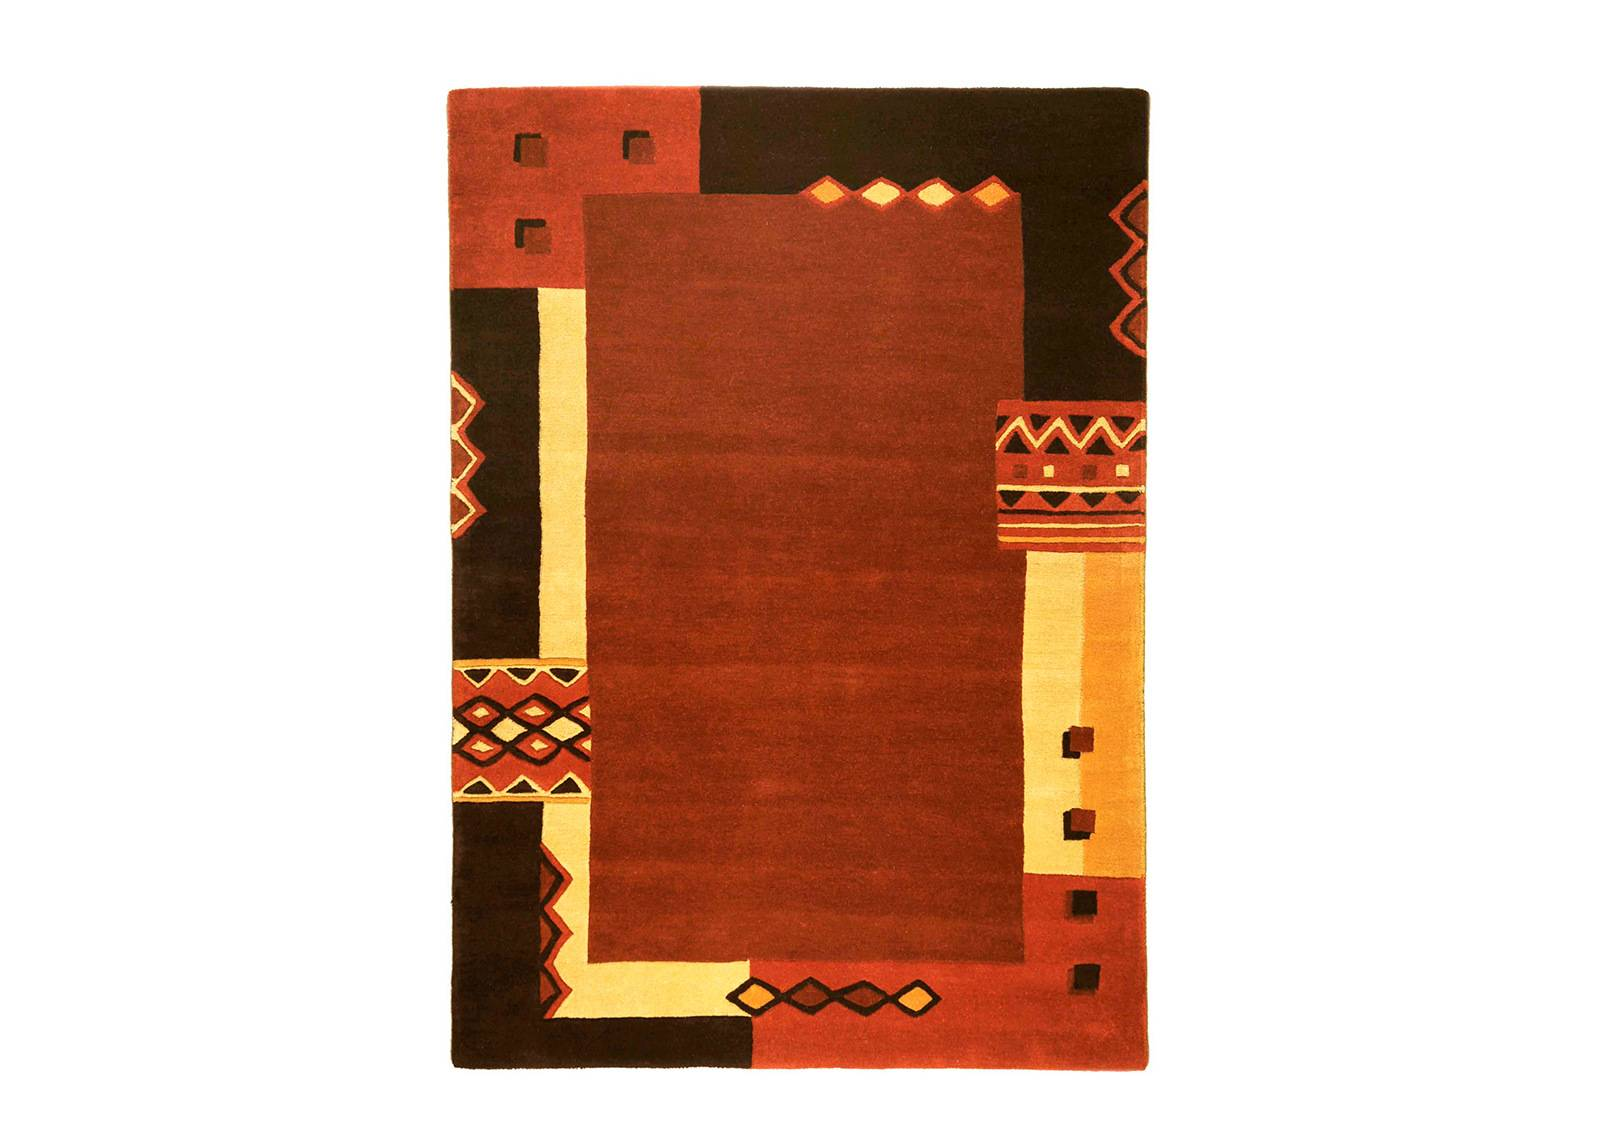 Theko Matto Harmony 160x230 cm